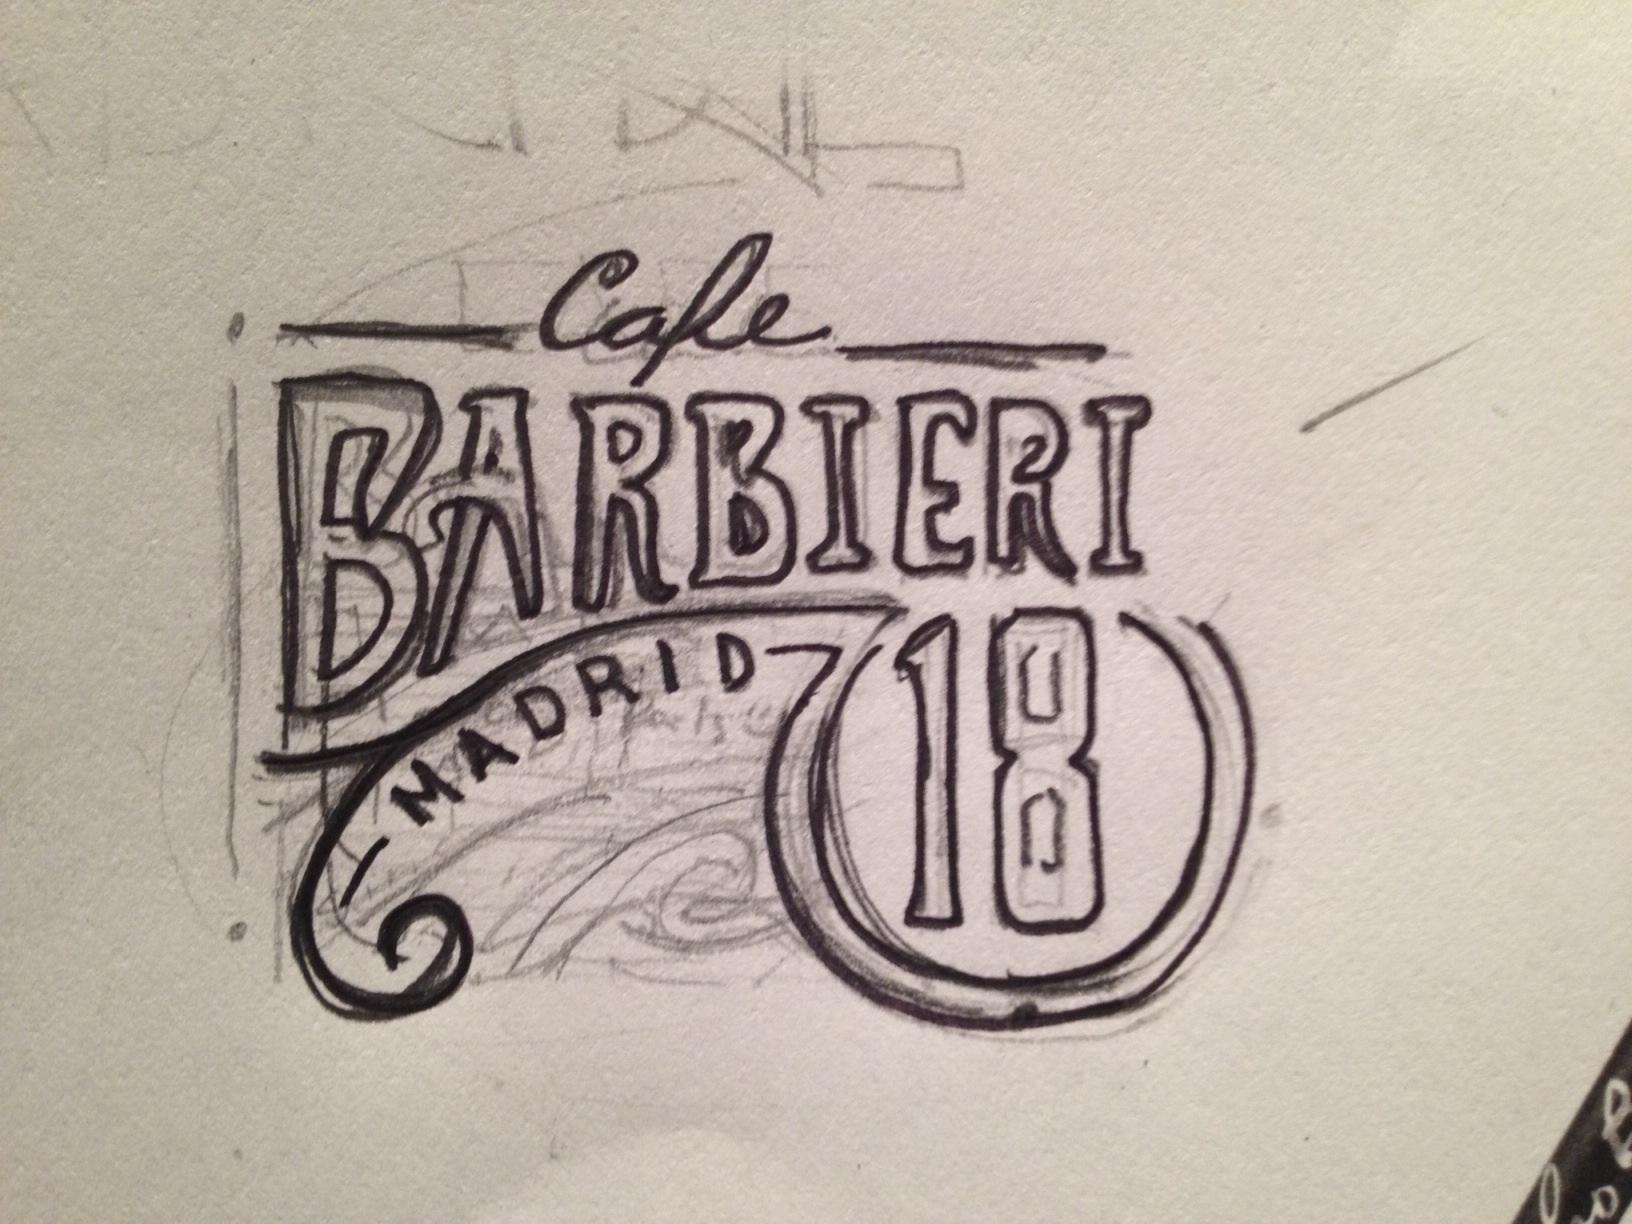 BARBIERI 18 - image 5 - student project